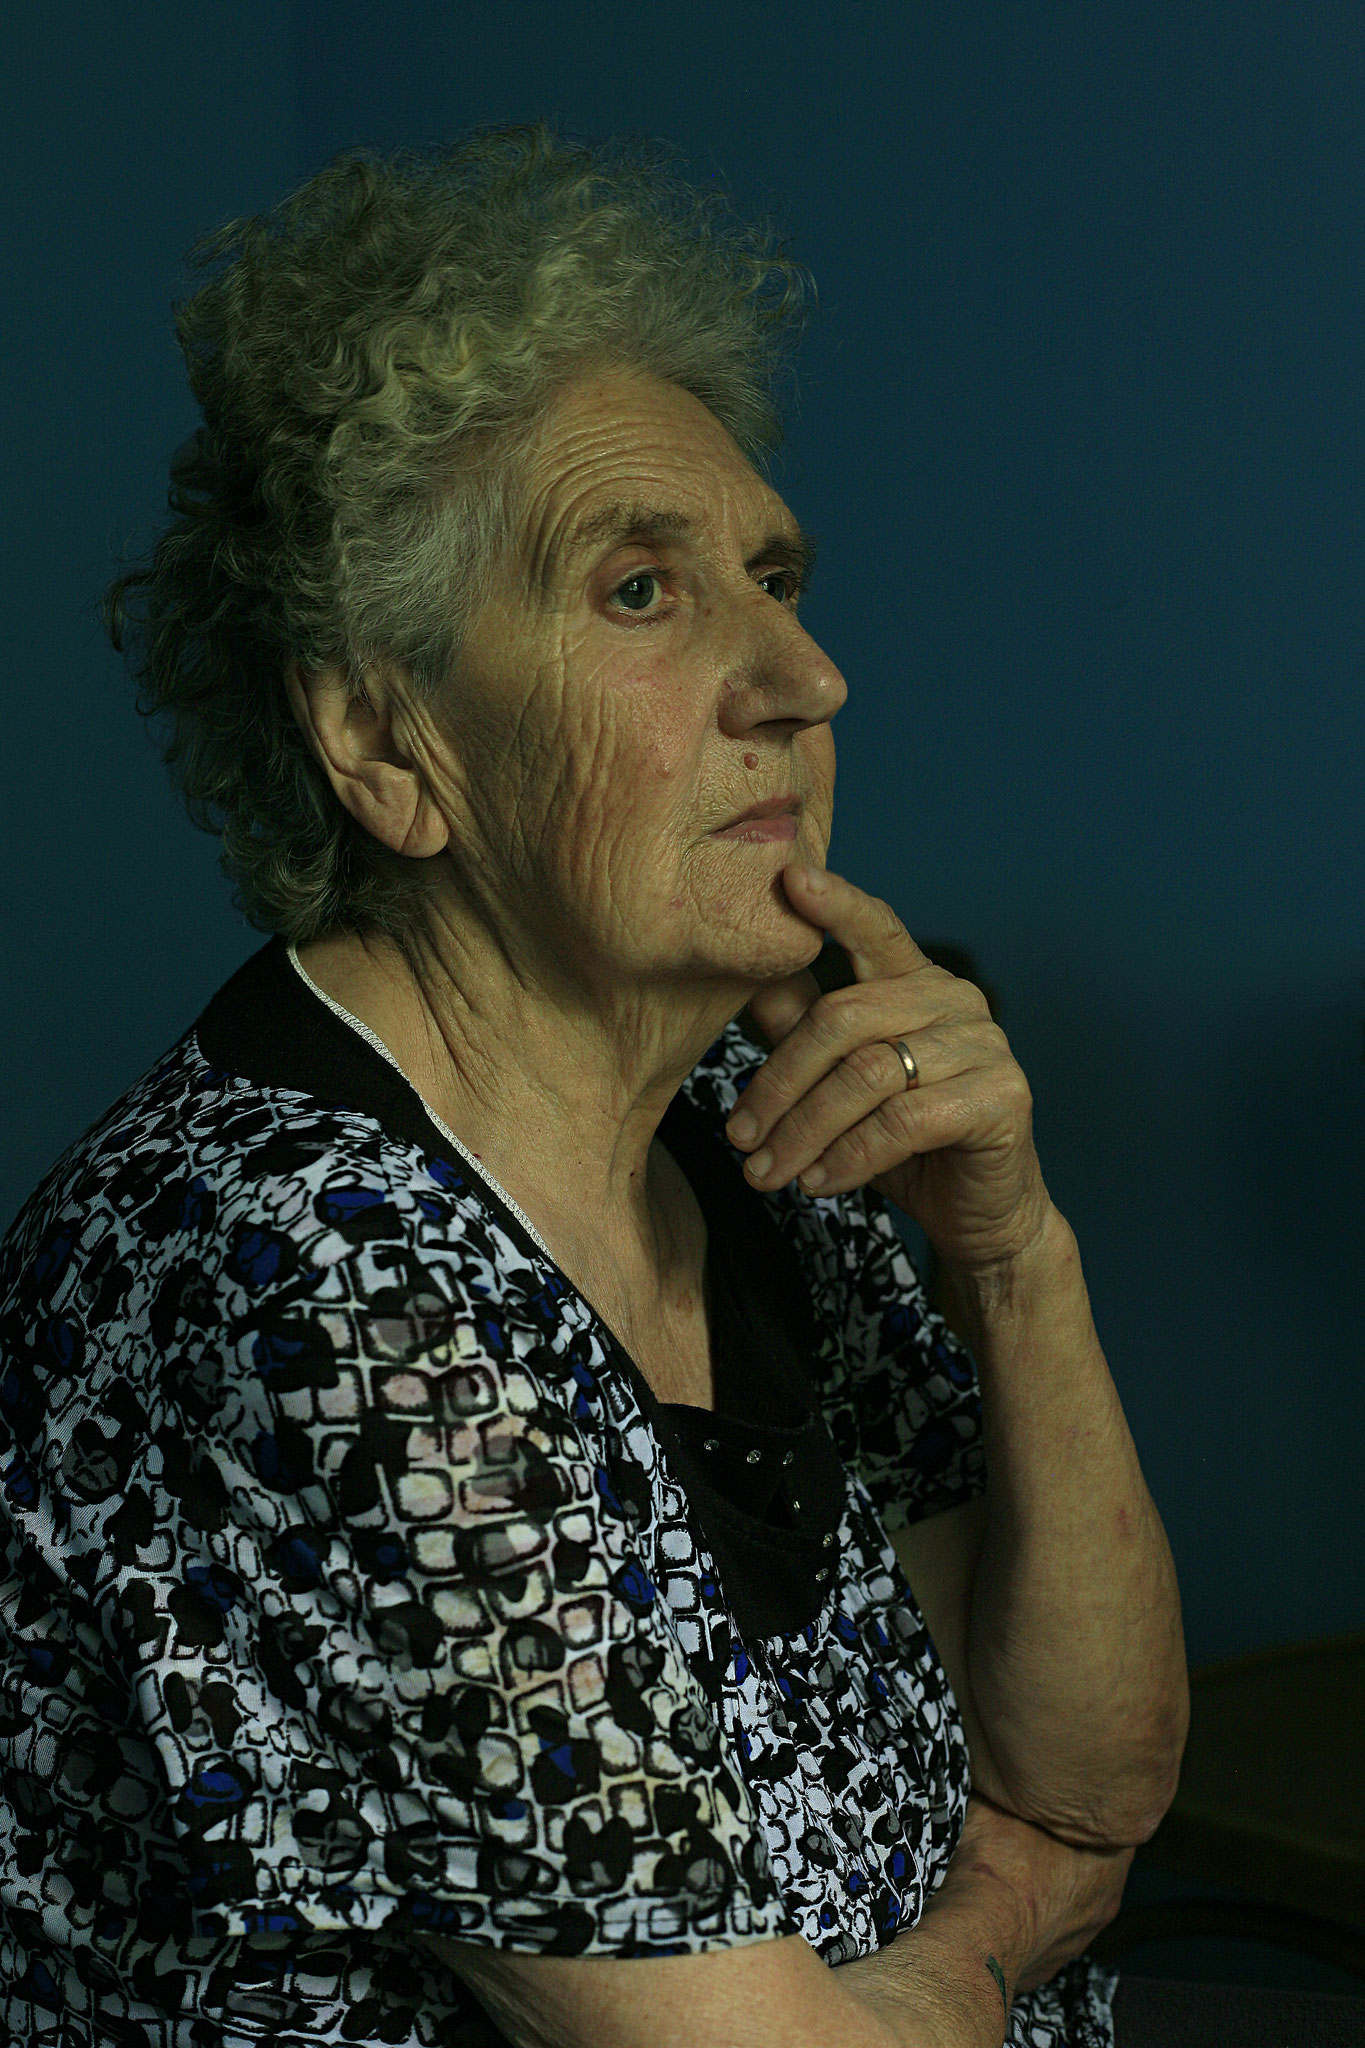 Olha Norba (Ukraine)  - Memory of the Grandmother